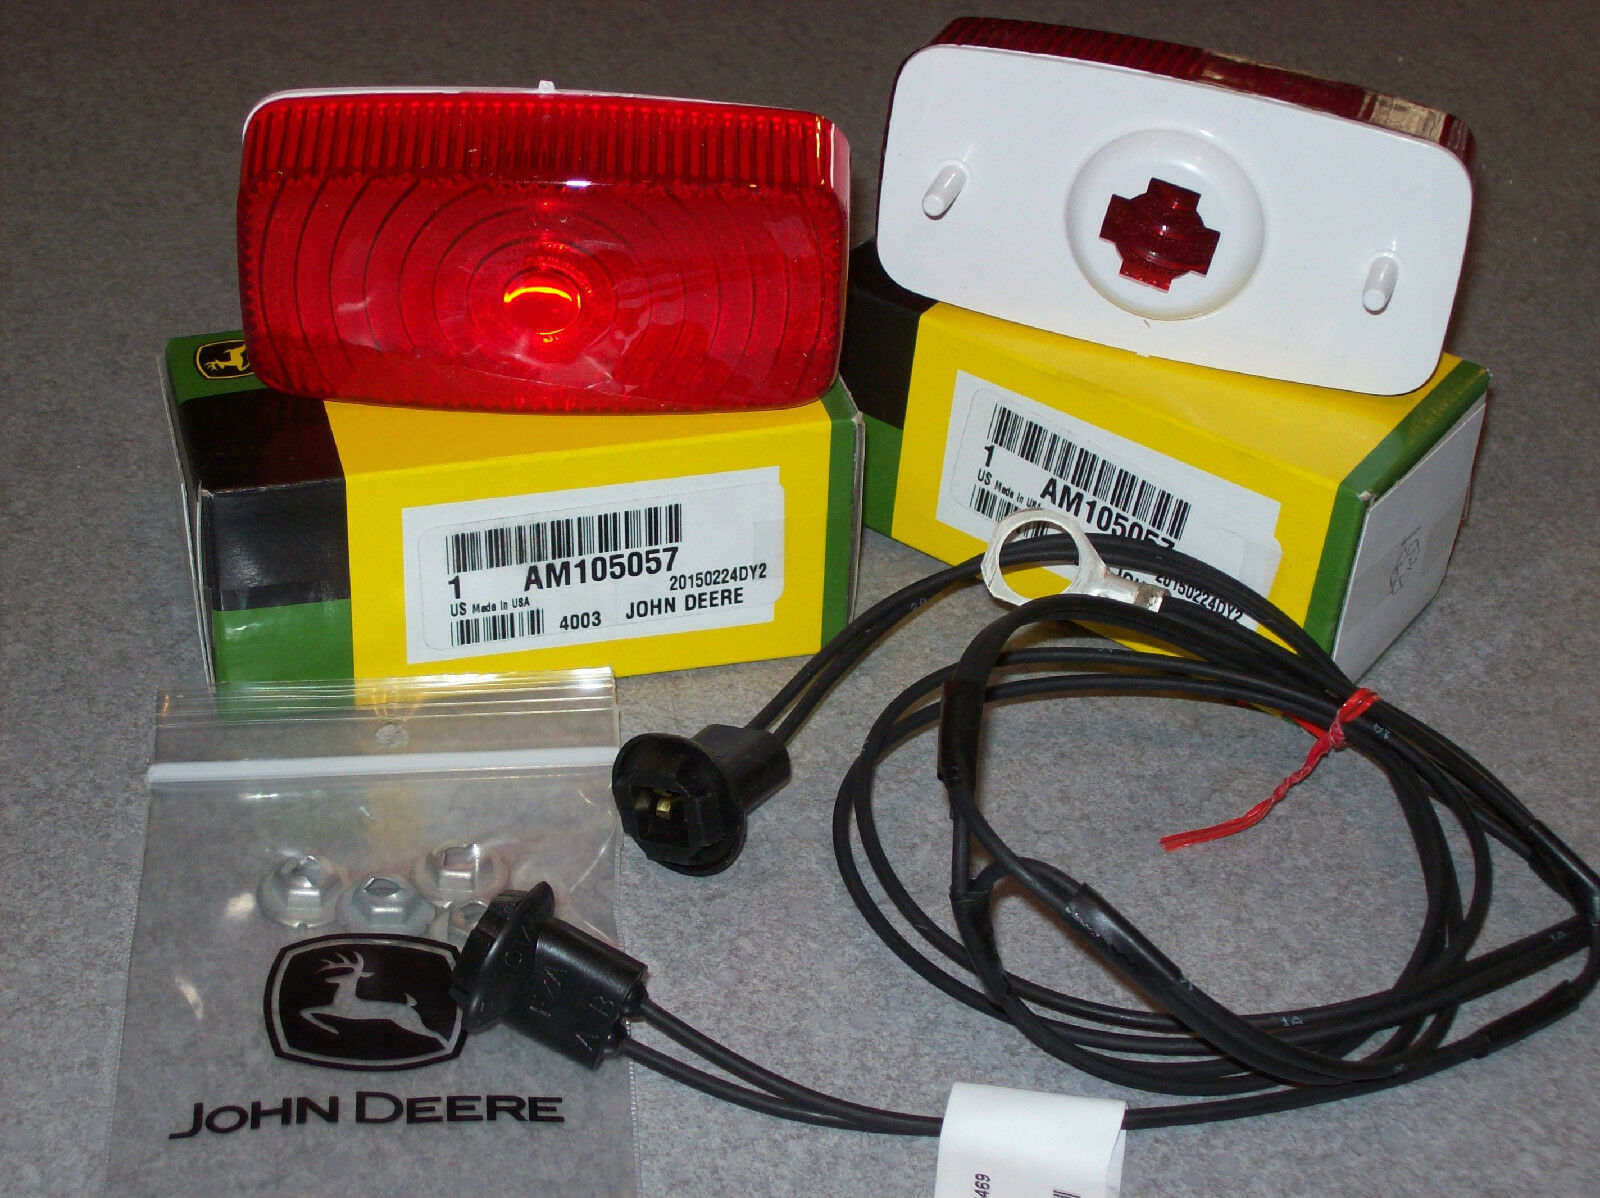 John Deere 210 212 214 216 300 312 316 317 400 Taillights New Wiring Harness Am105057 Am35469 Ebay